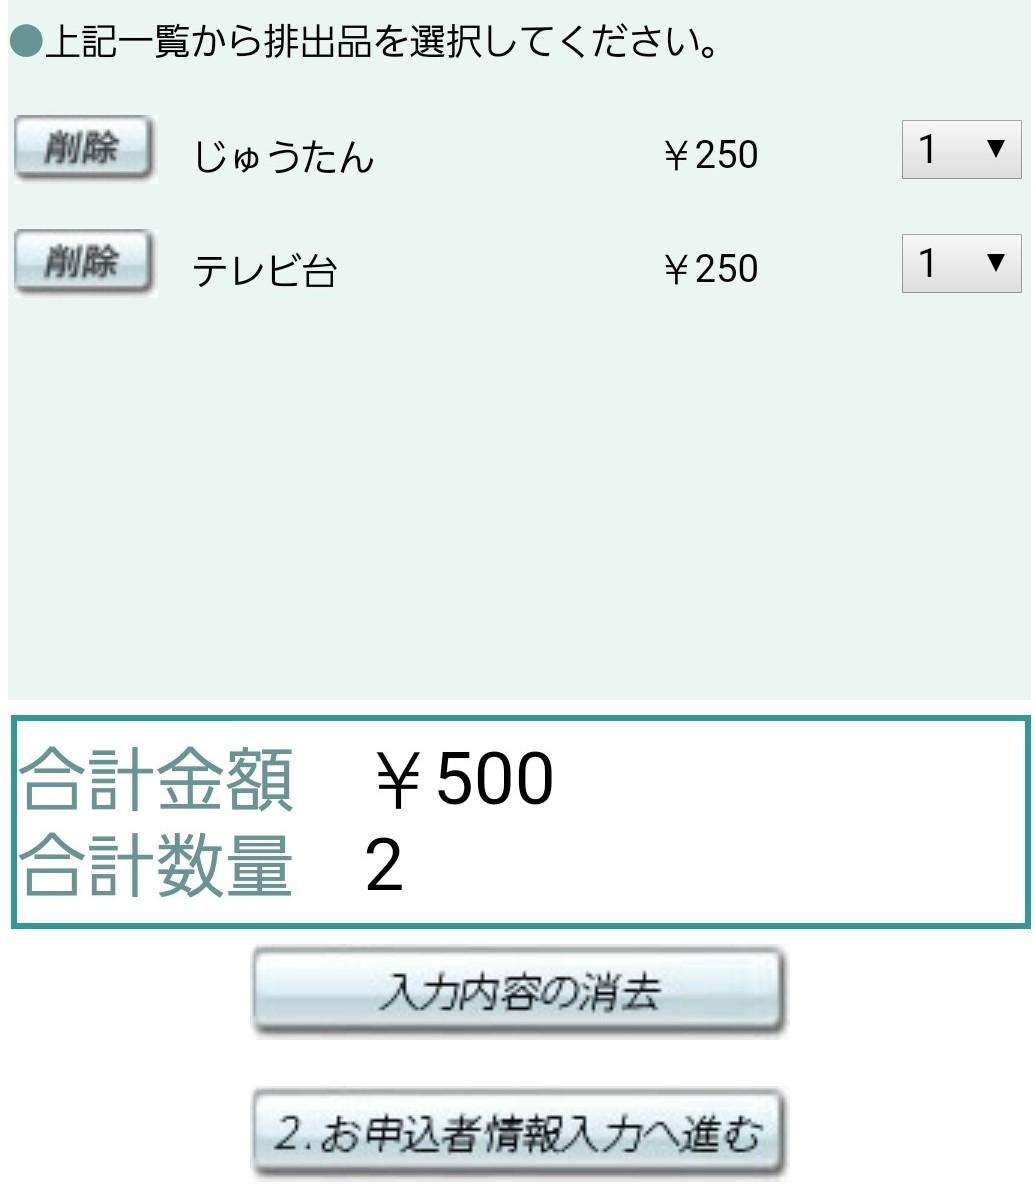 f:id:jjyy:20210109144440j:plain